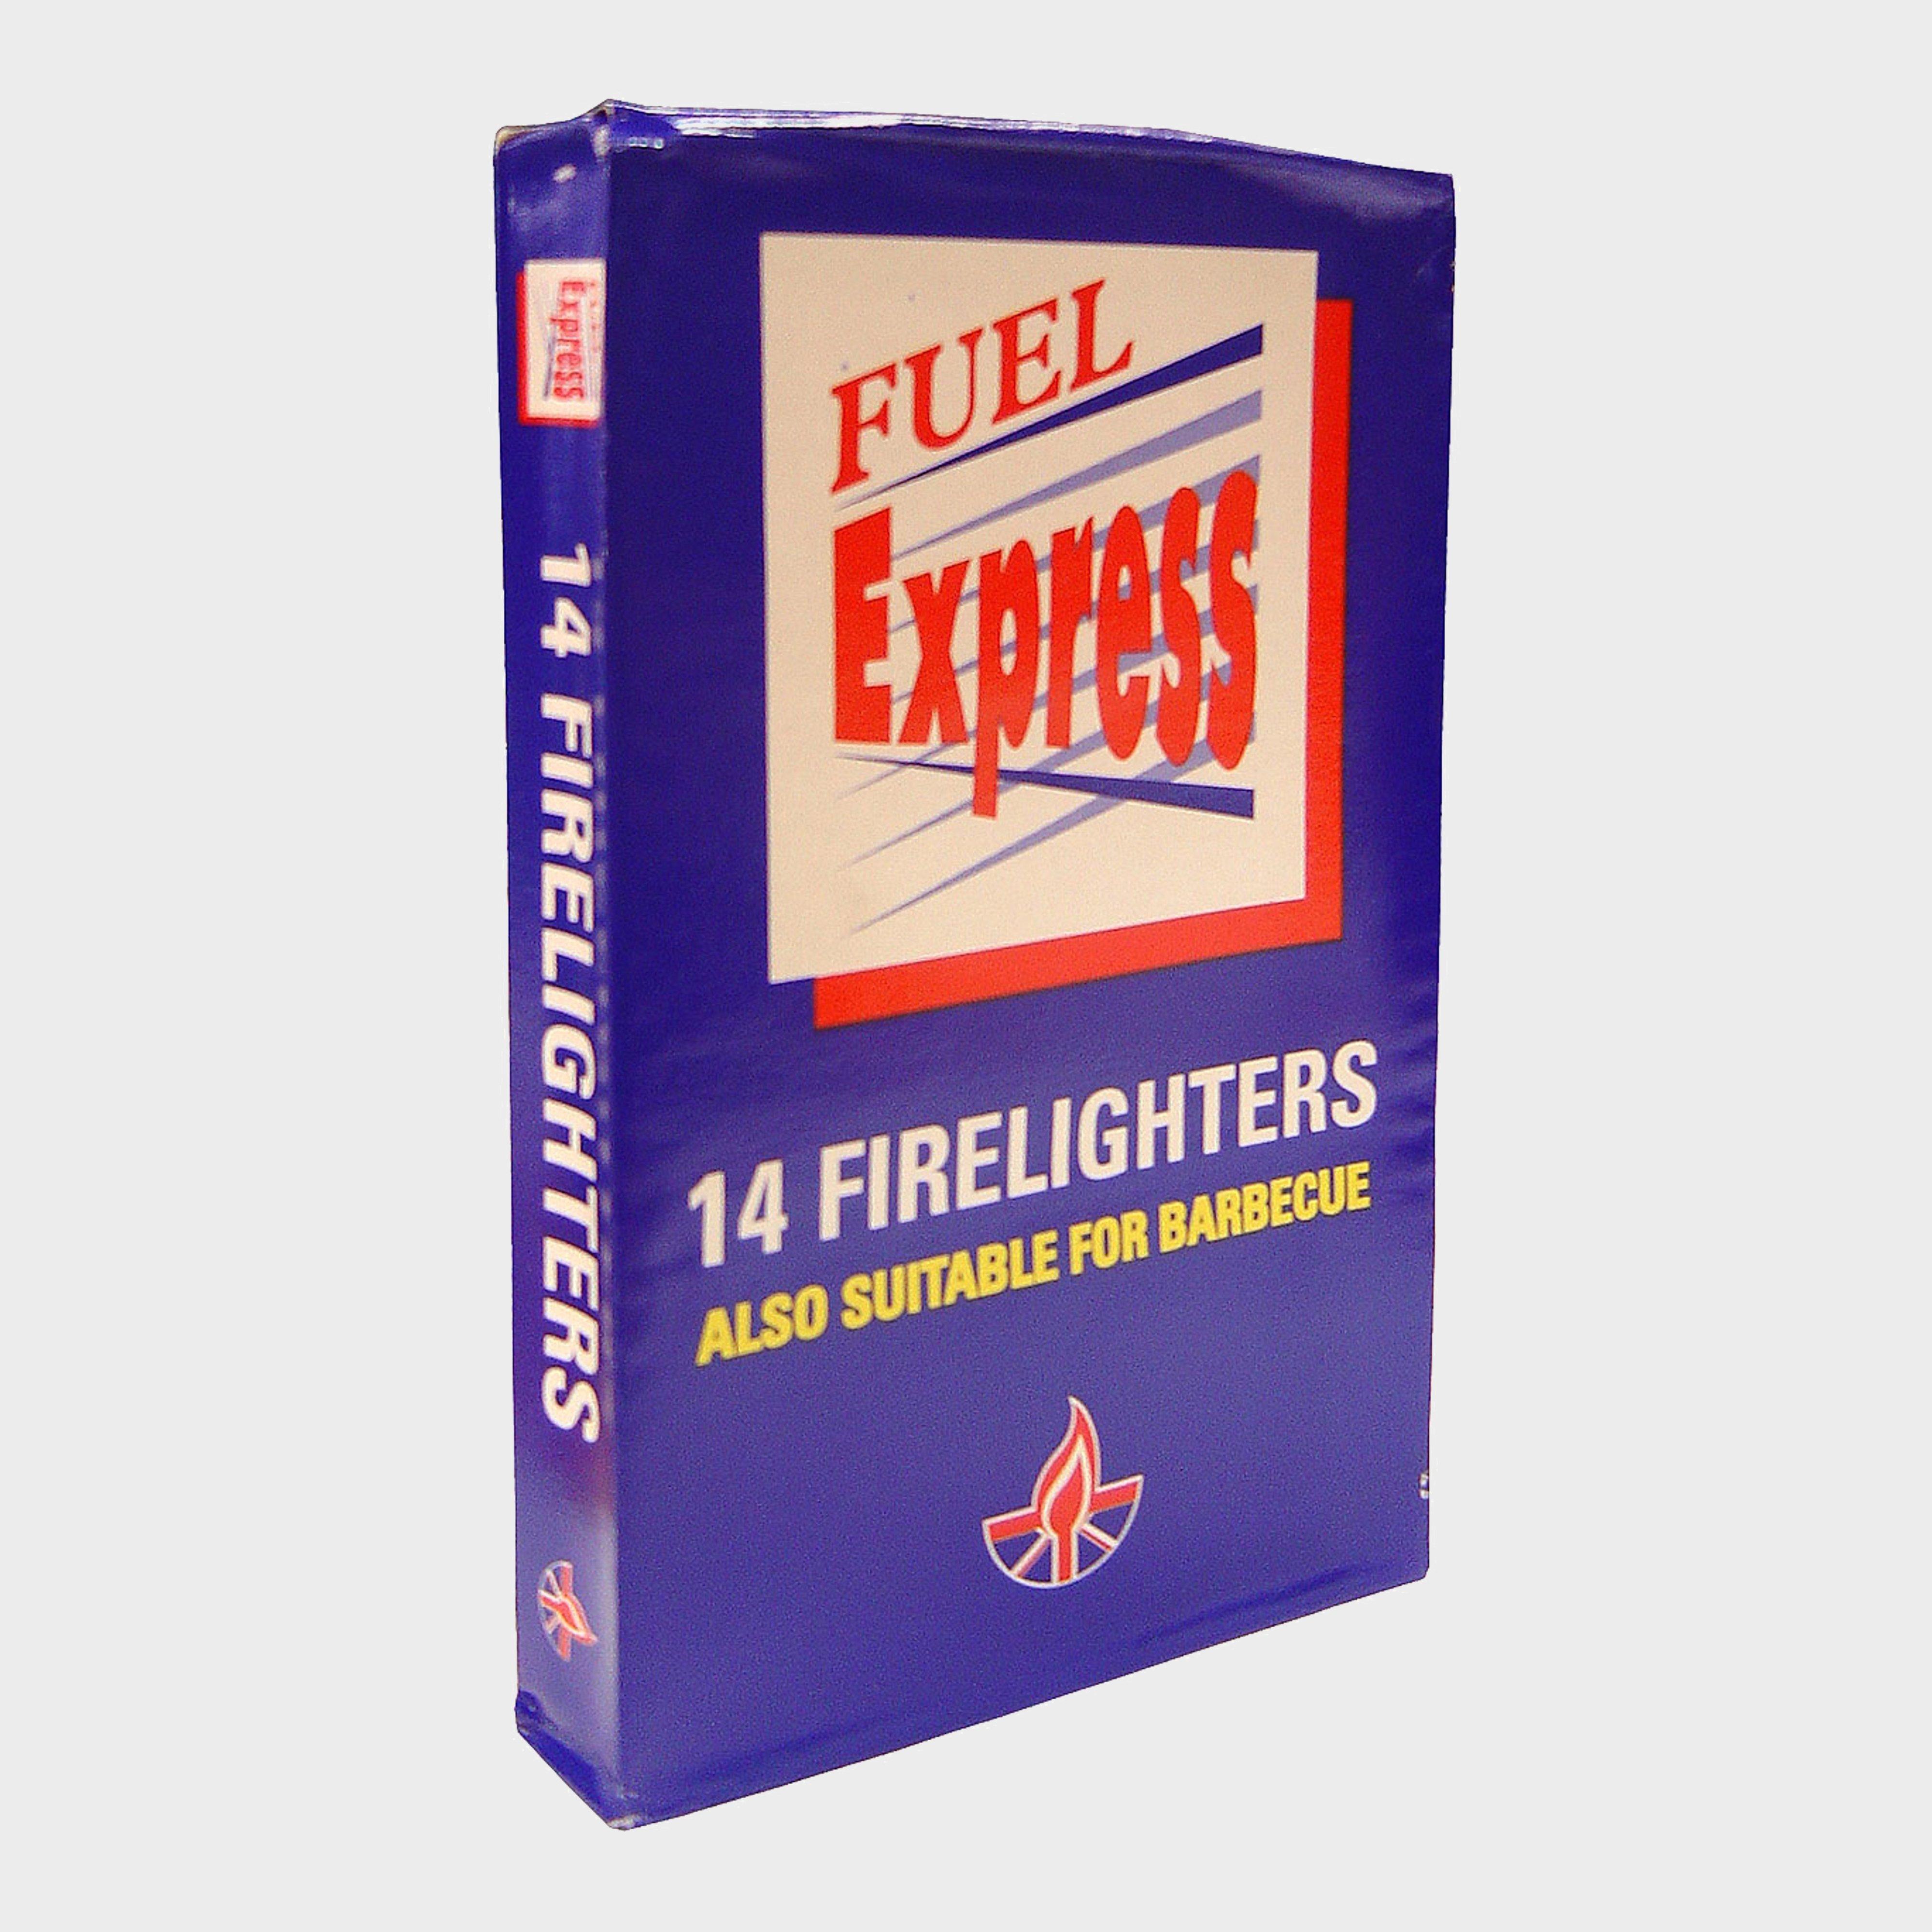 Quest Quest Barbecue Fire Lighter Blocks